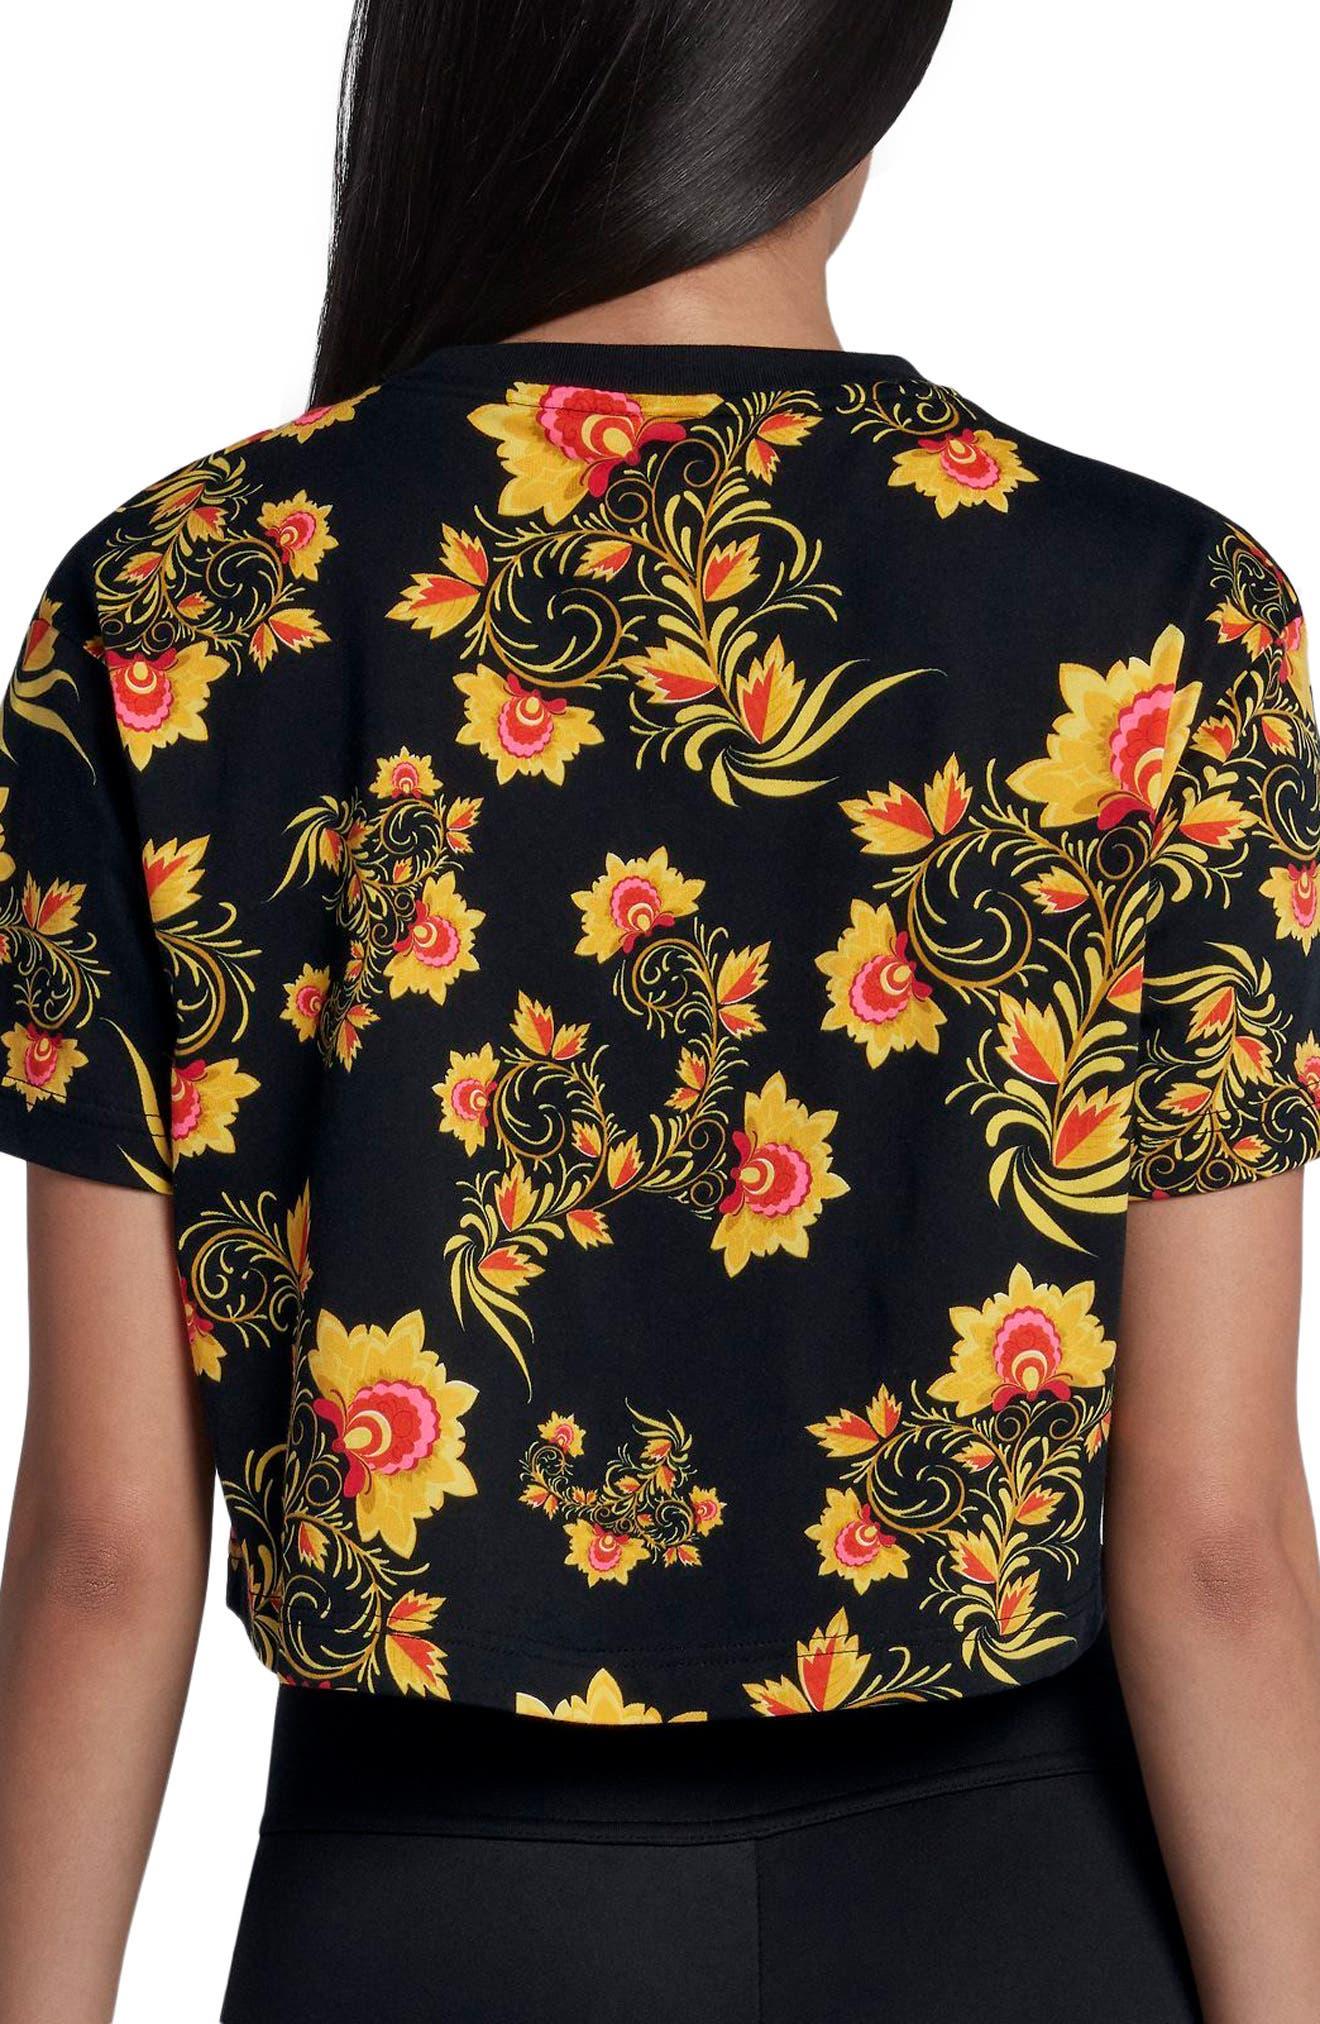 Sportswear Russian Floral Print Crop Tee,                             Alternate thumbnail 2, color,                             010